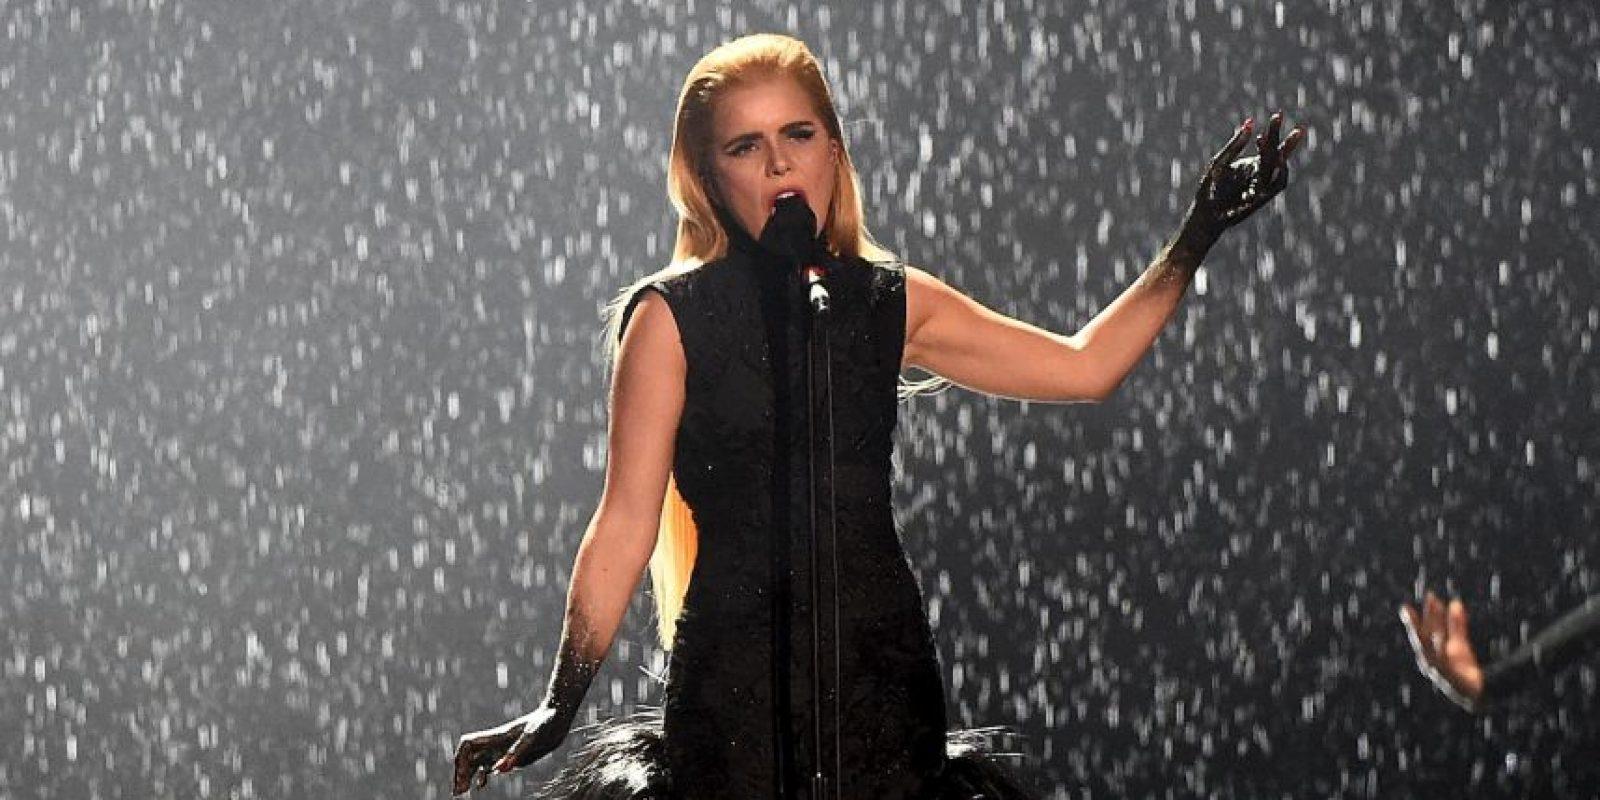 Mejor intérprete femenina británica – Paloma Faith Foto:Getty Images